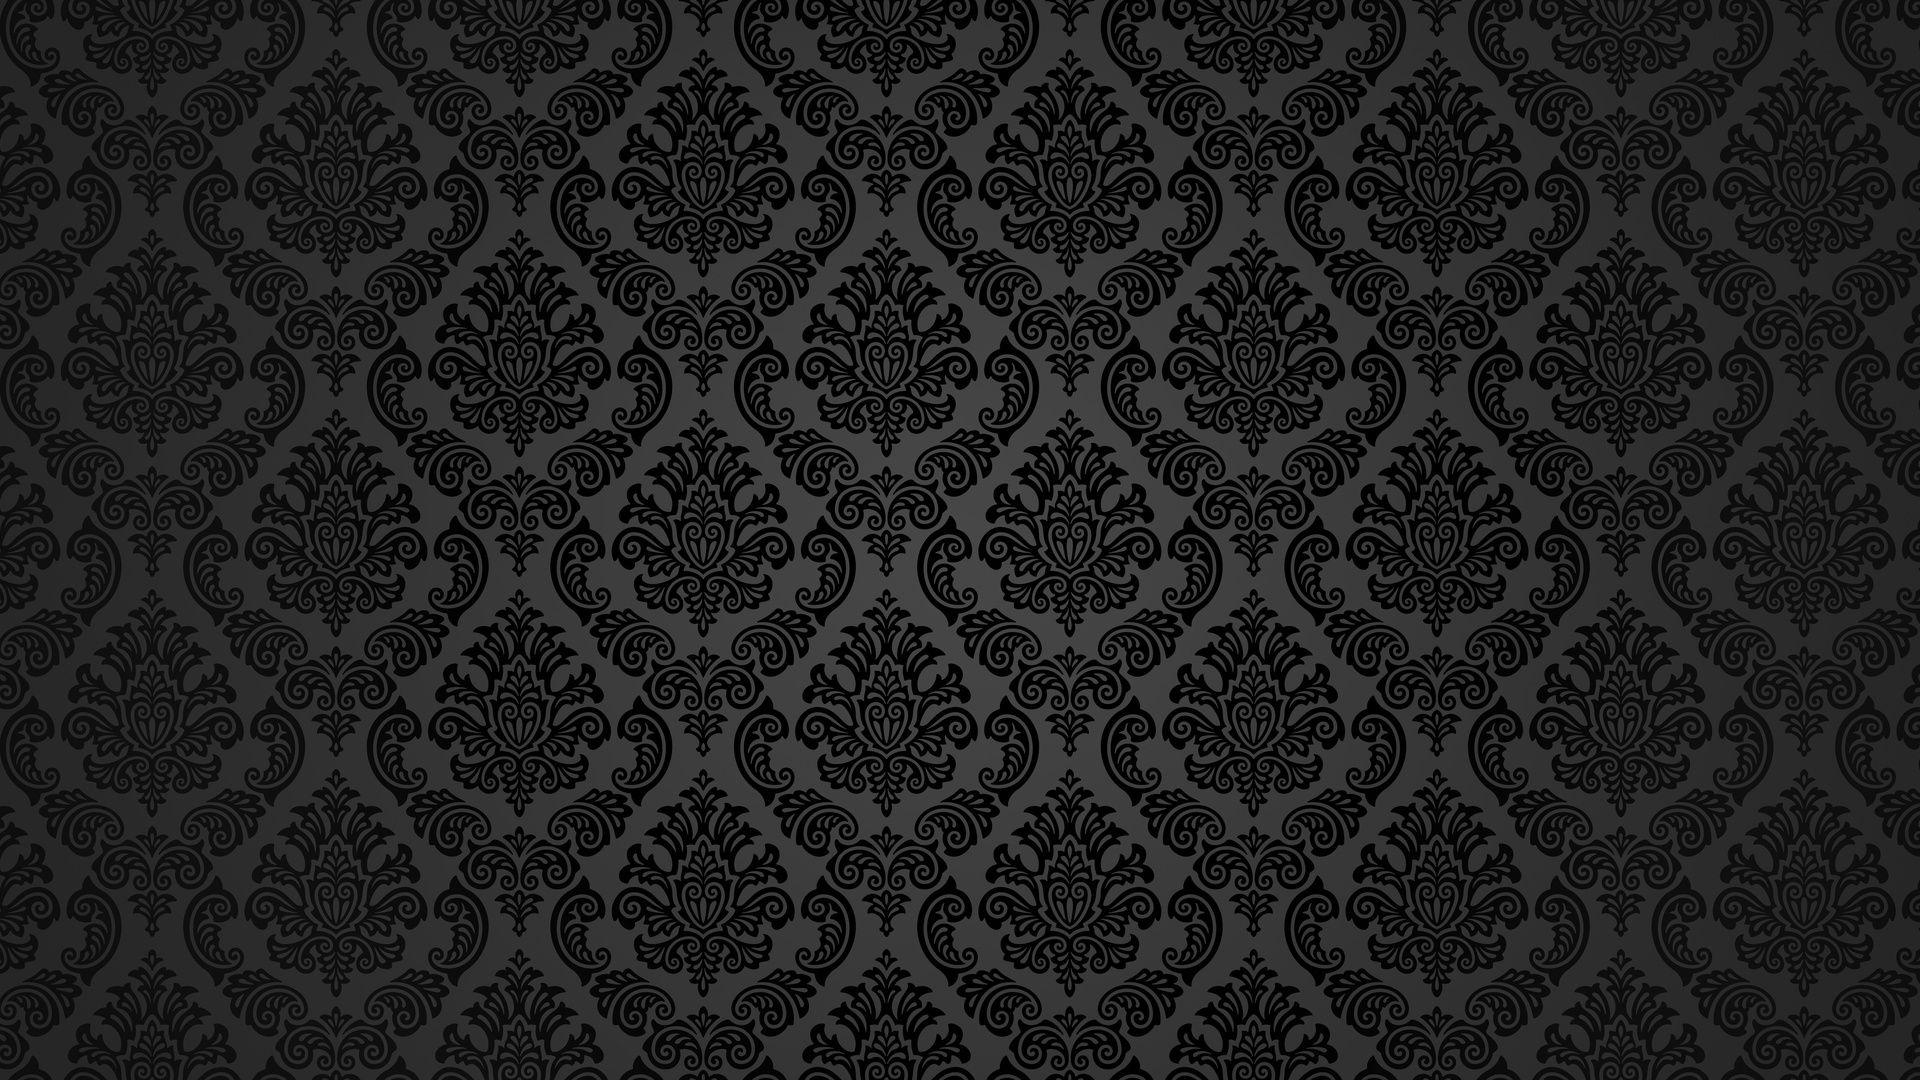 Black Vintage Wallpaper Patterns Retro Vintage Wallpapers